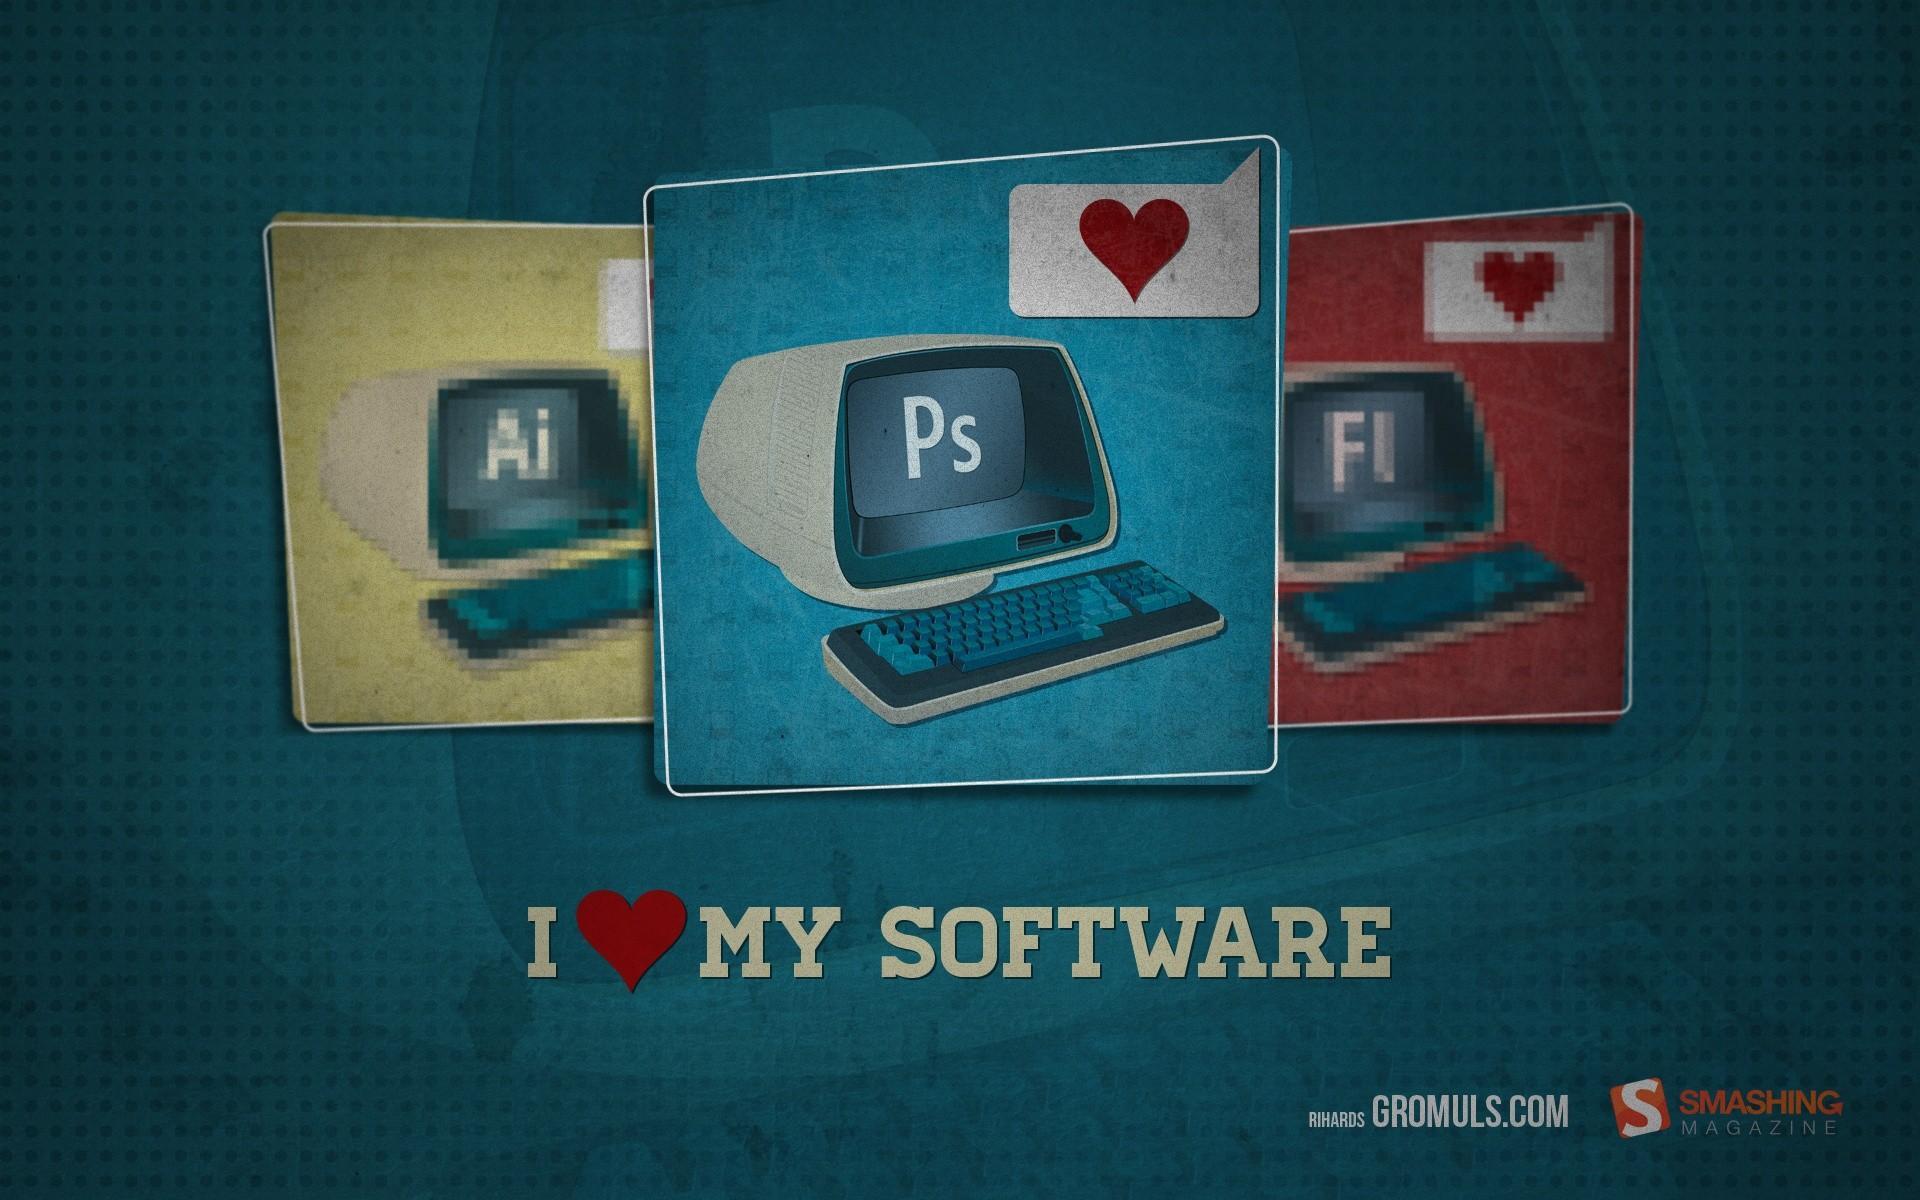 computers typography Adobe hearts Photoshop Smashing magazine blue background softwares - Wallpaper (#2212709) / Wallbase.cc